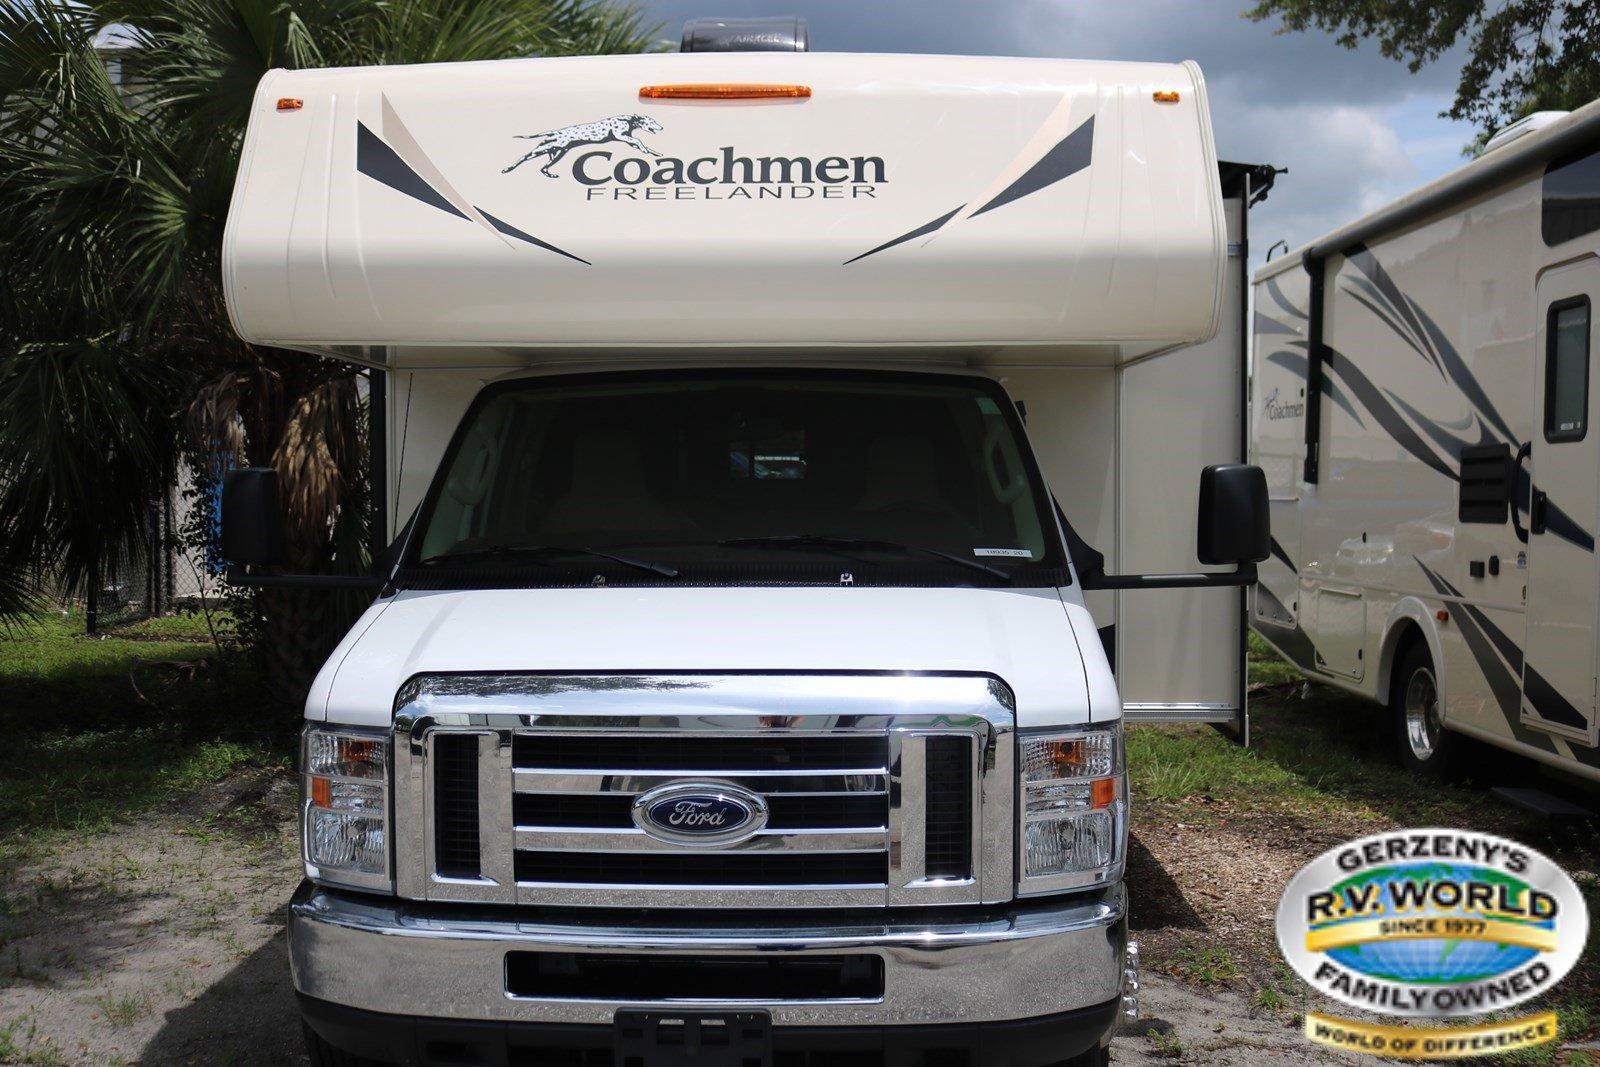 2020 Coachmen Freelander 31BH Thumbnail